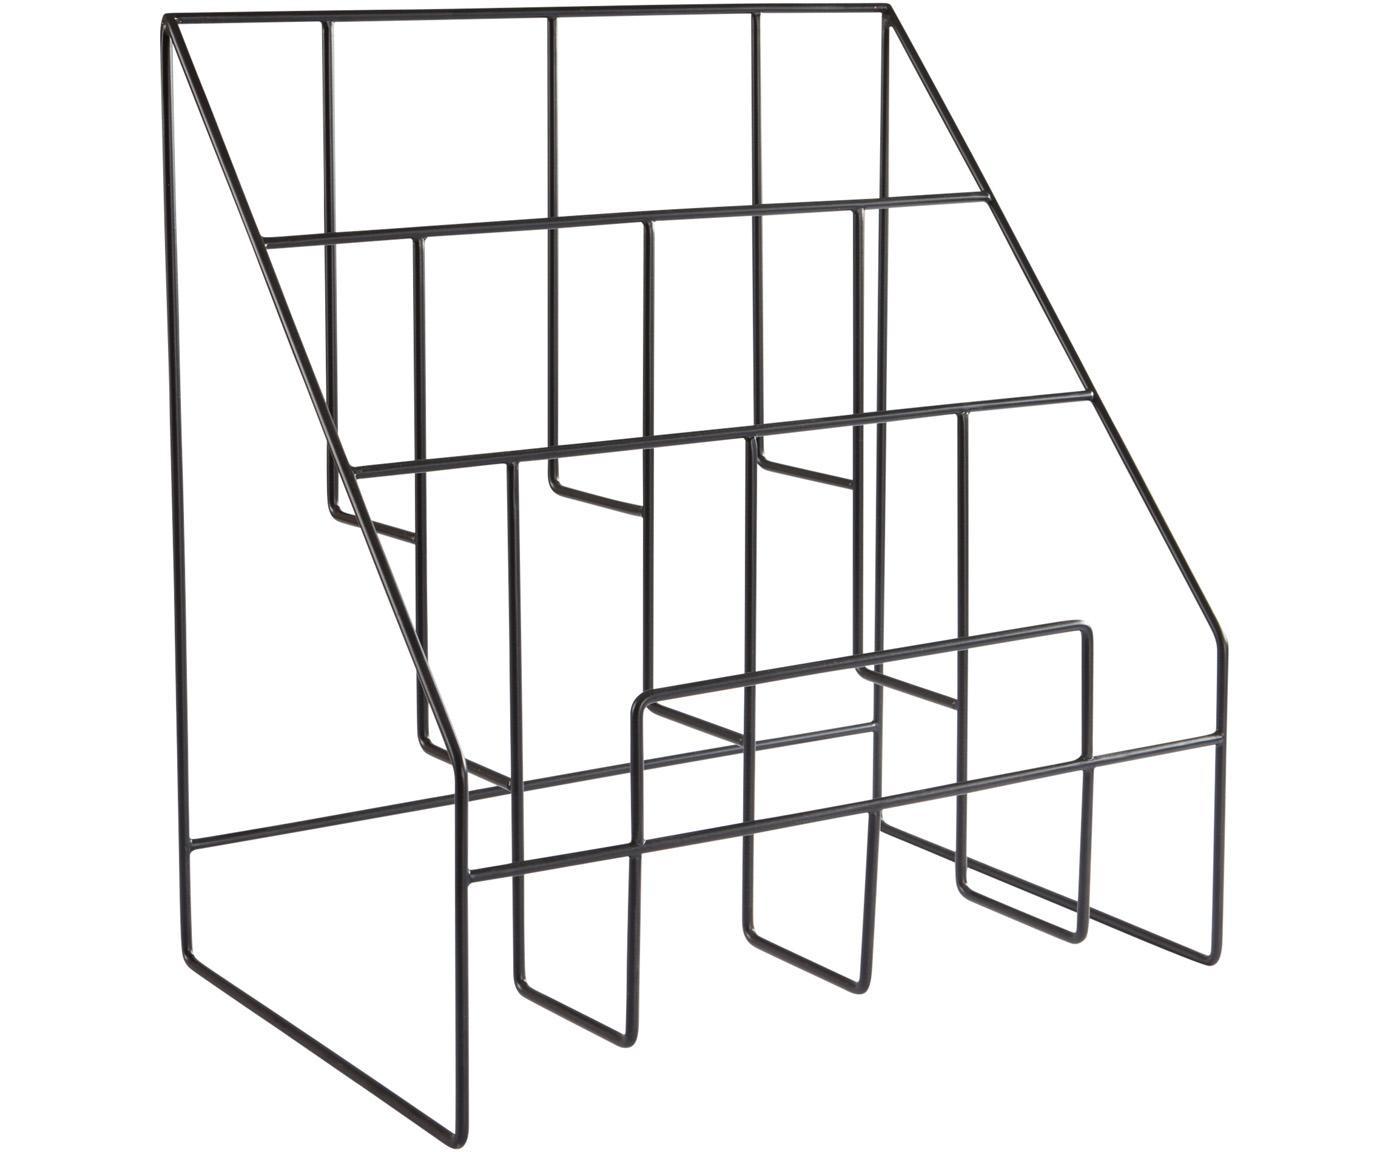 Portariviste Freddy, Metallo verniciato, Nero, Larg. 38 x Alt. 41 cm